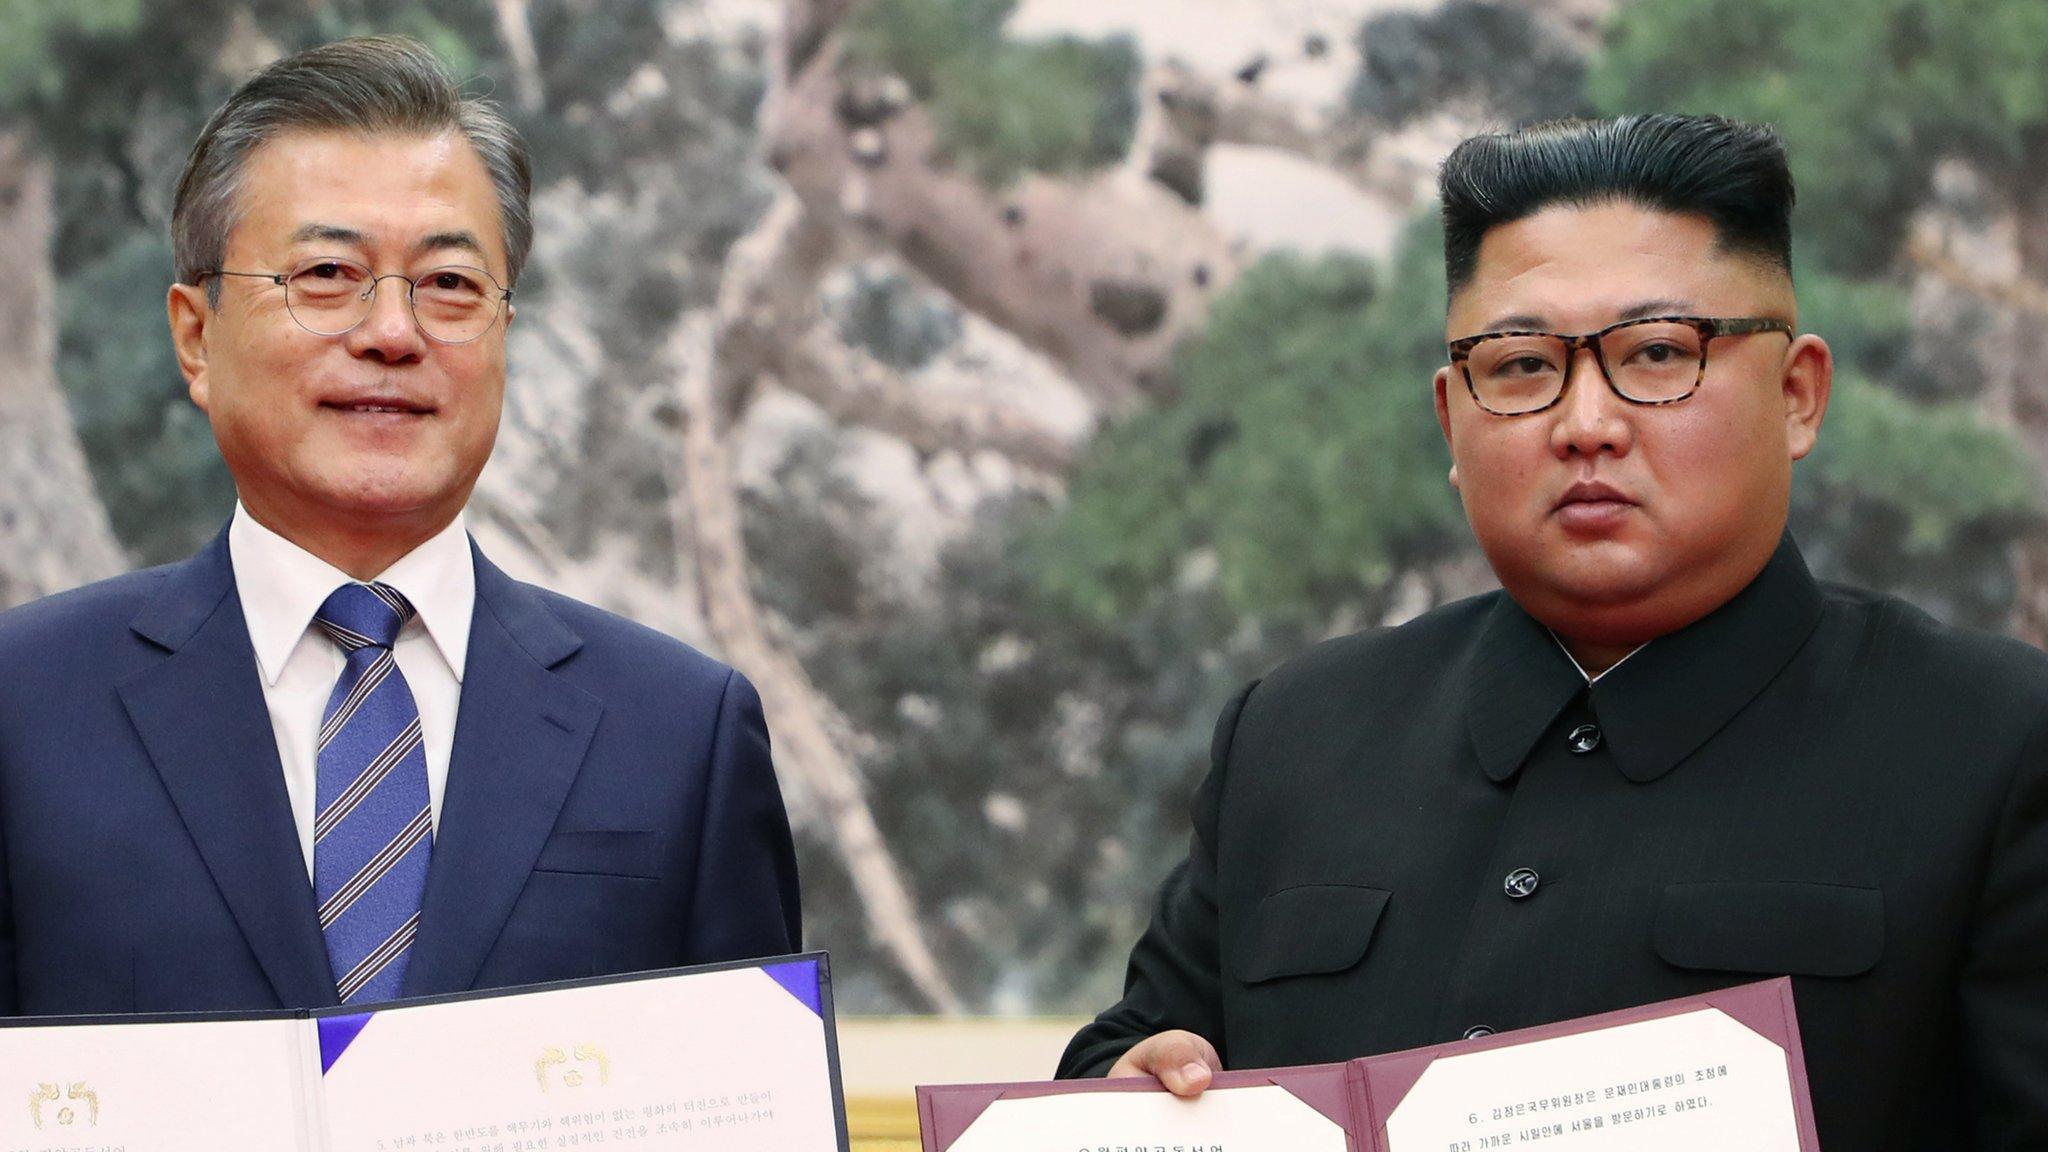 North & South Korea agree 2032 Olympics bid